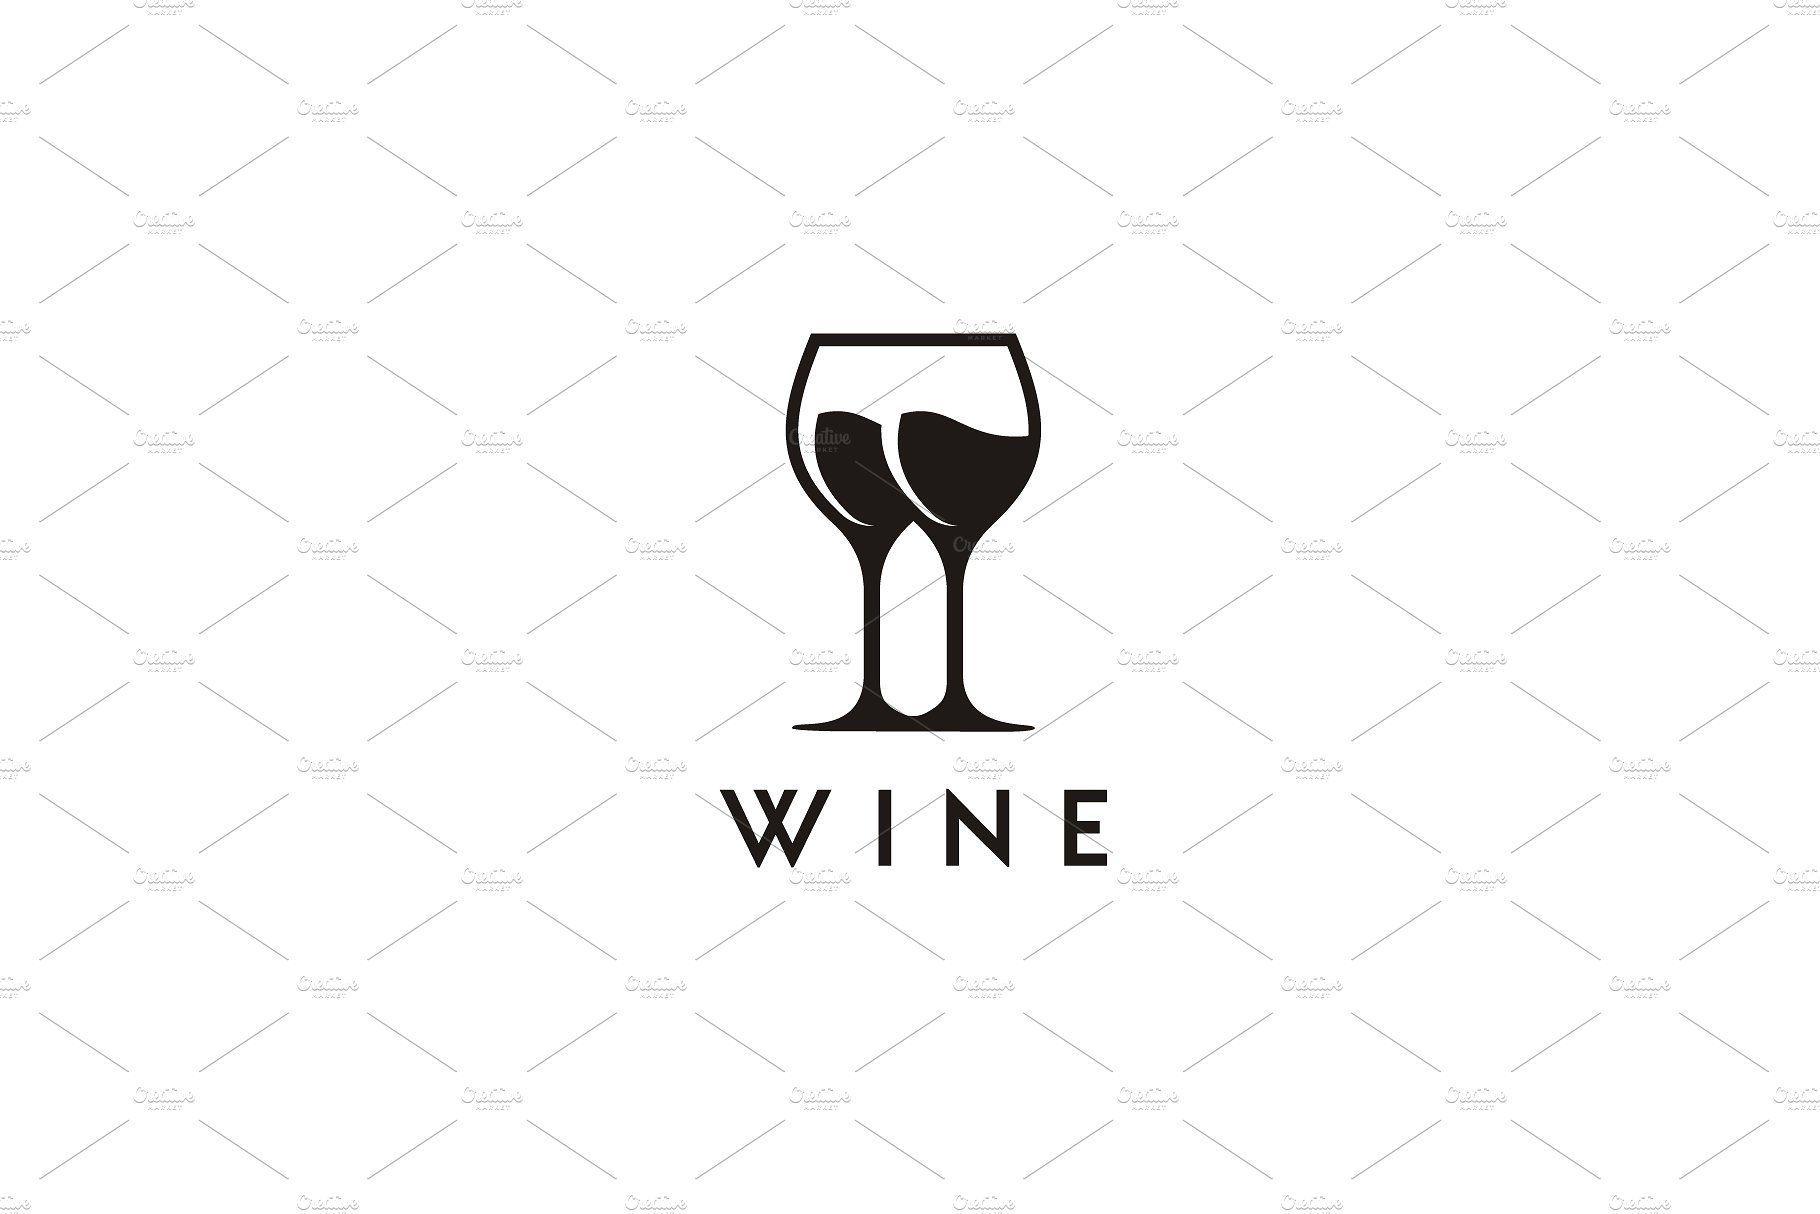 Black Wine glass symbol logo design #logo #design #wine.